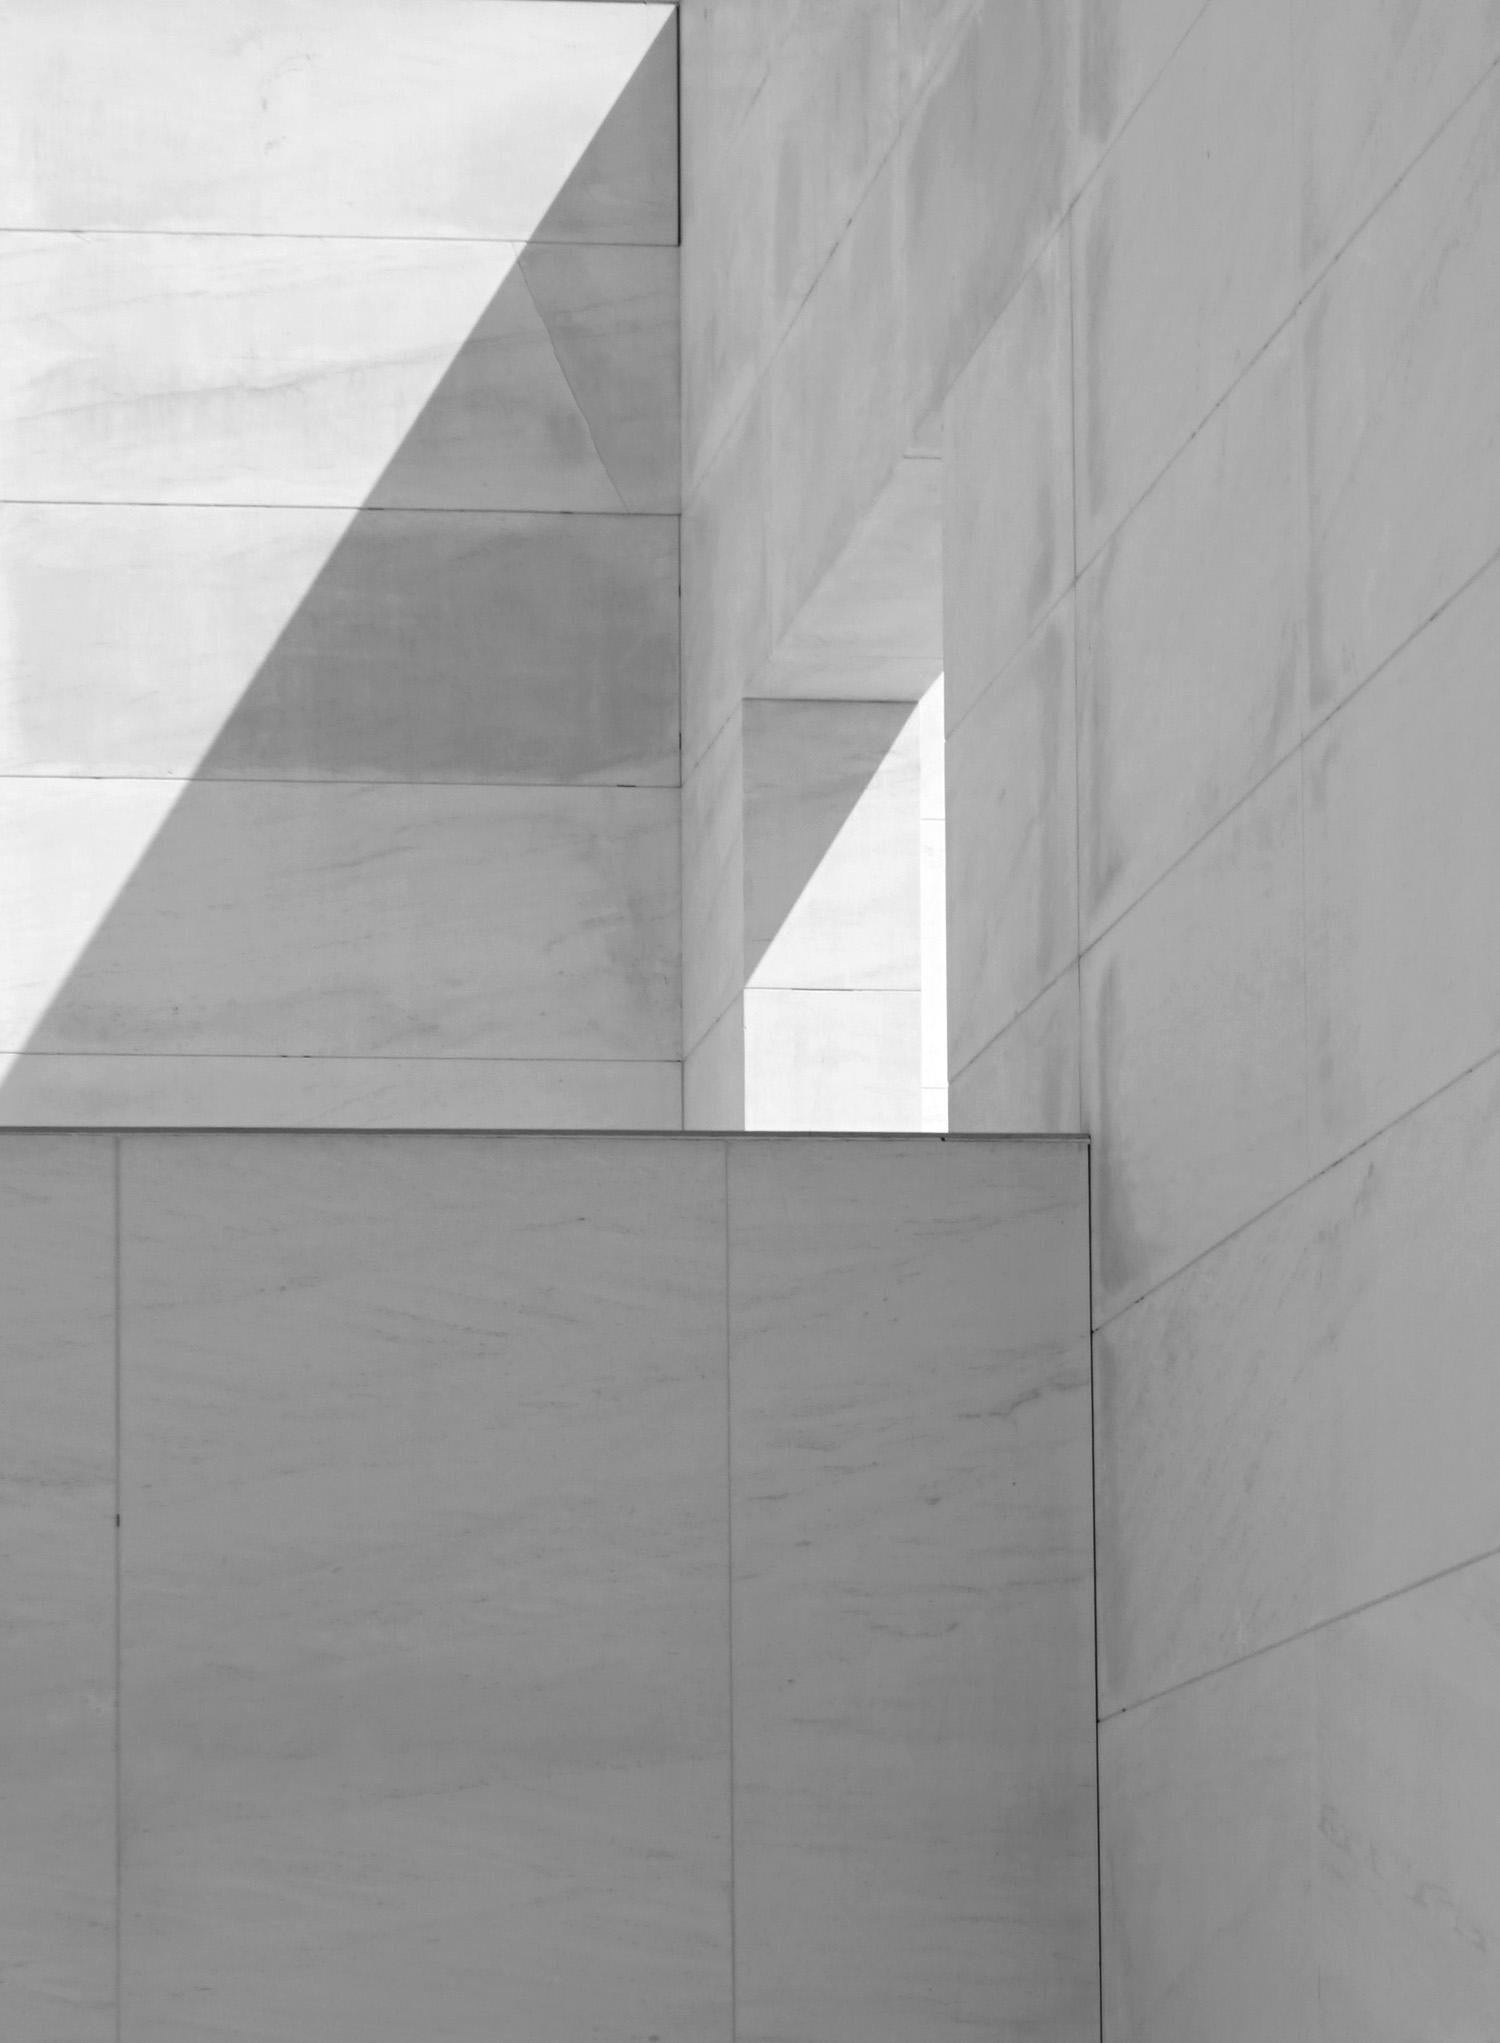 Emily-Grundon_architecture_spaces_0030.jpg